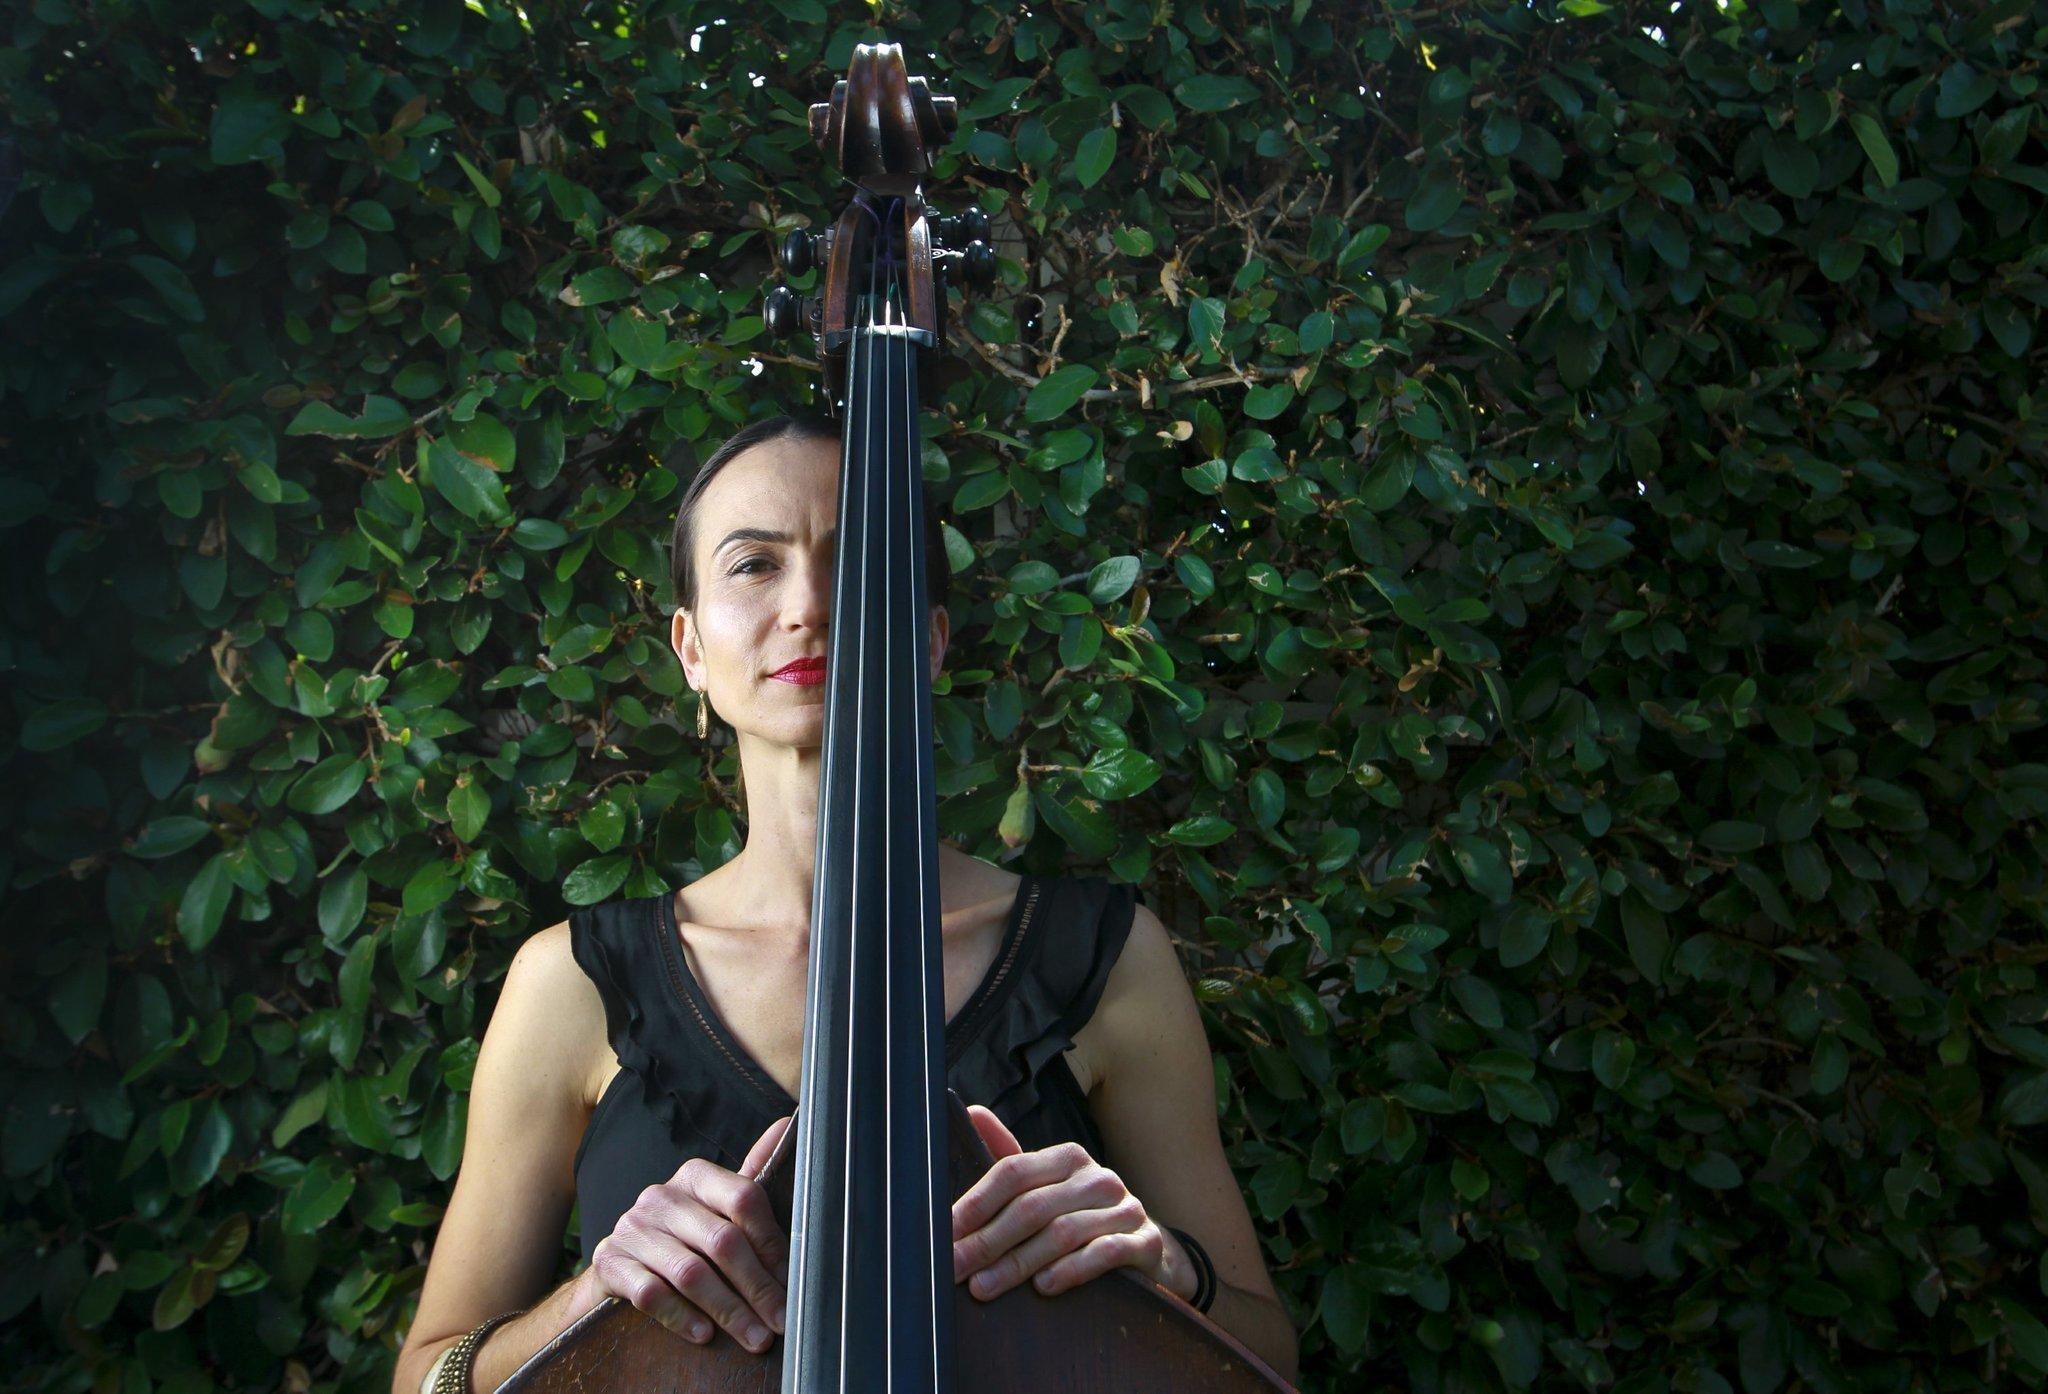 Bassist Evona Wascinski on being American